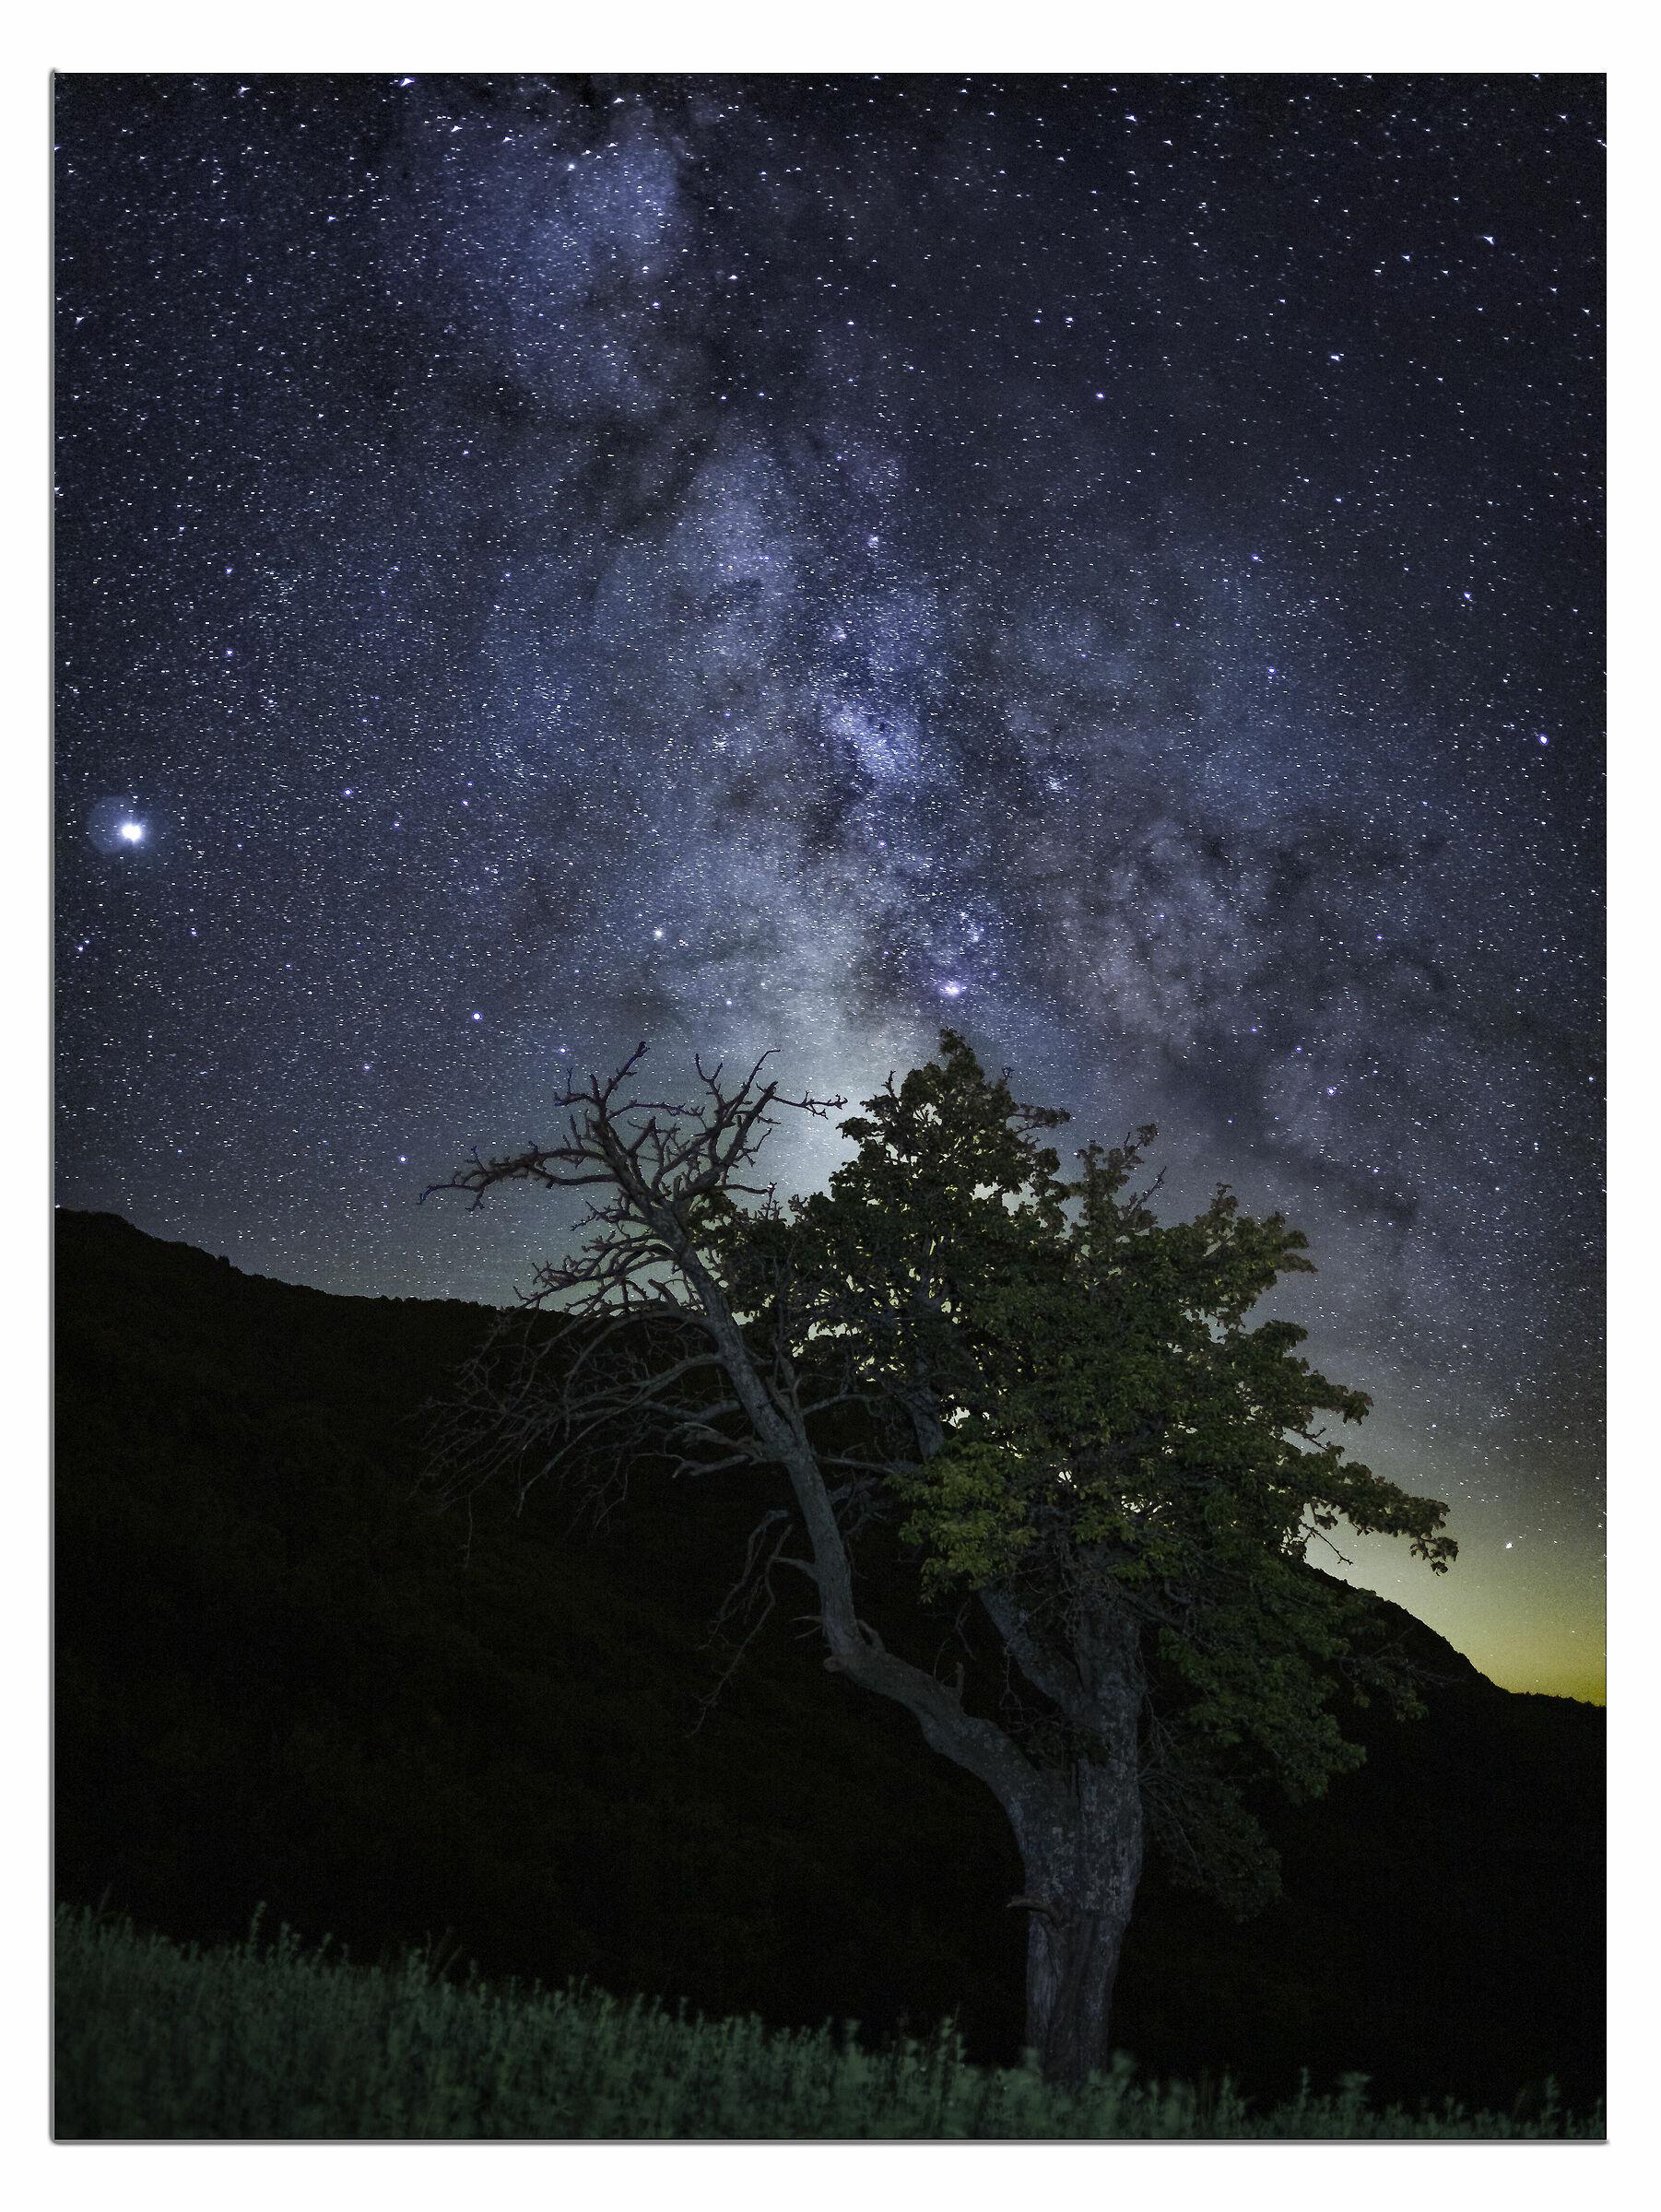 Another Milky Way Development Test...